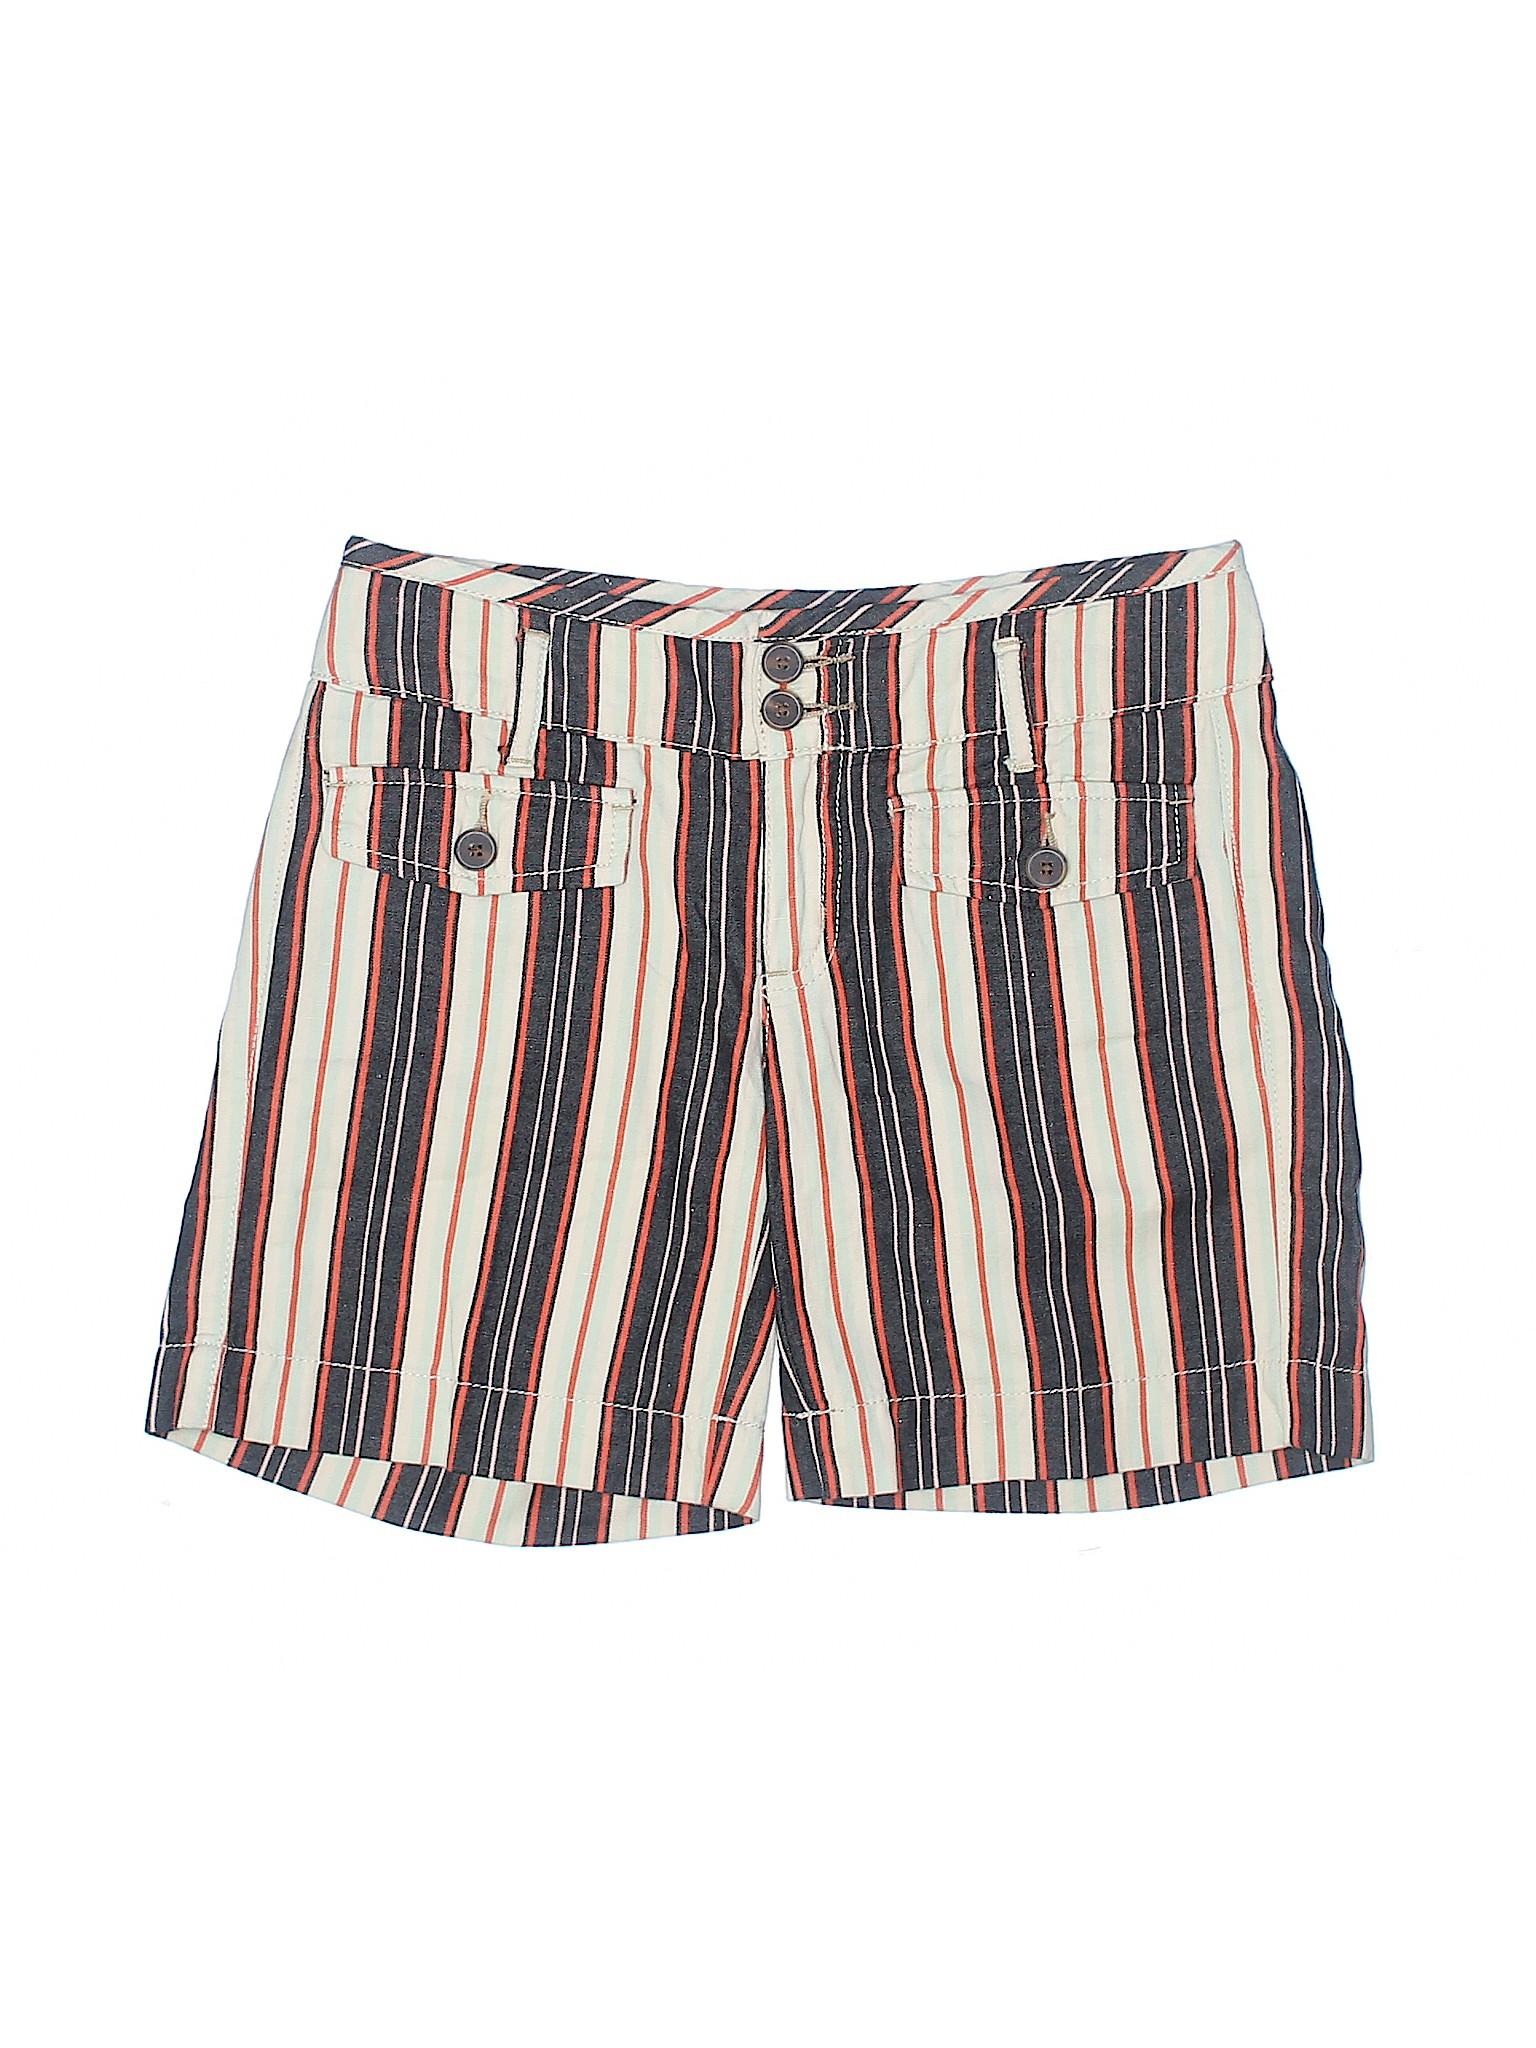 Hei Hei Khaki Boutique Hei Shorts Shorts Boutique Hei Khaki RwqnAwXv